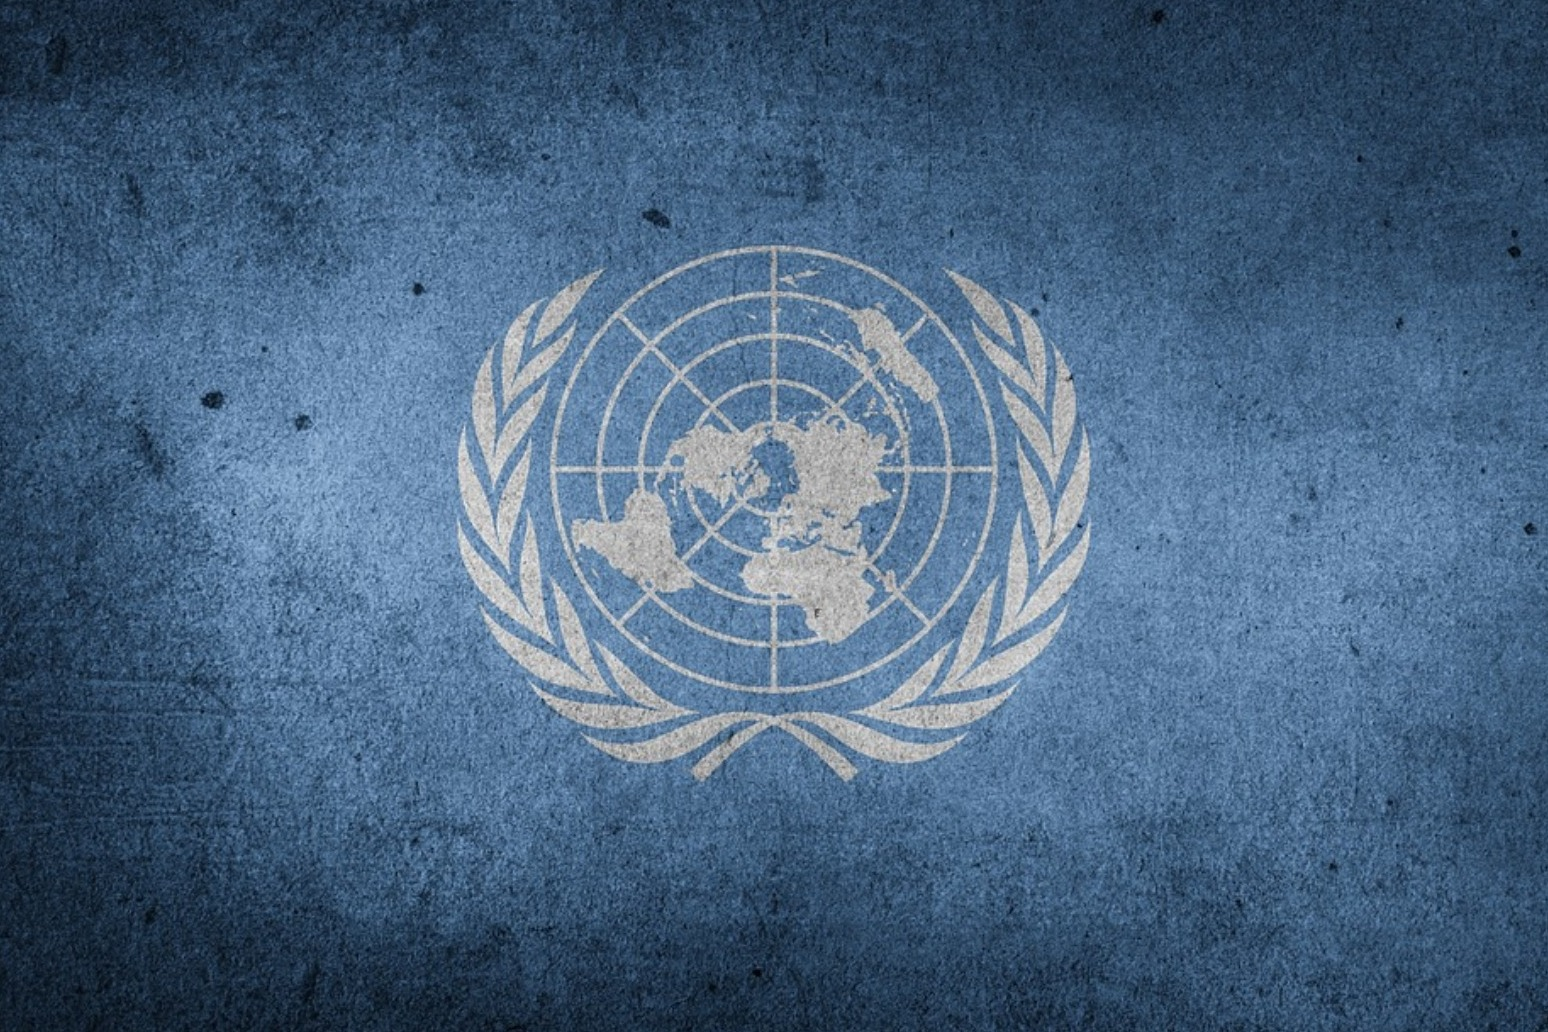 Big companies commit to slash emissions ahead of U.N. climate summit